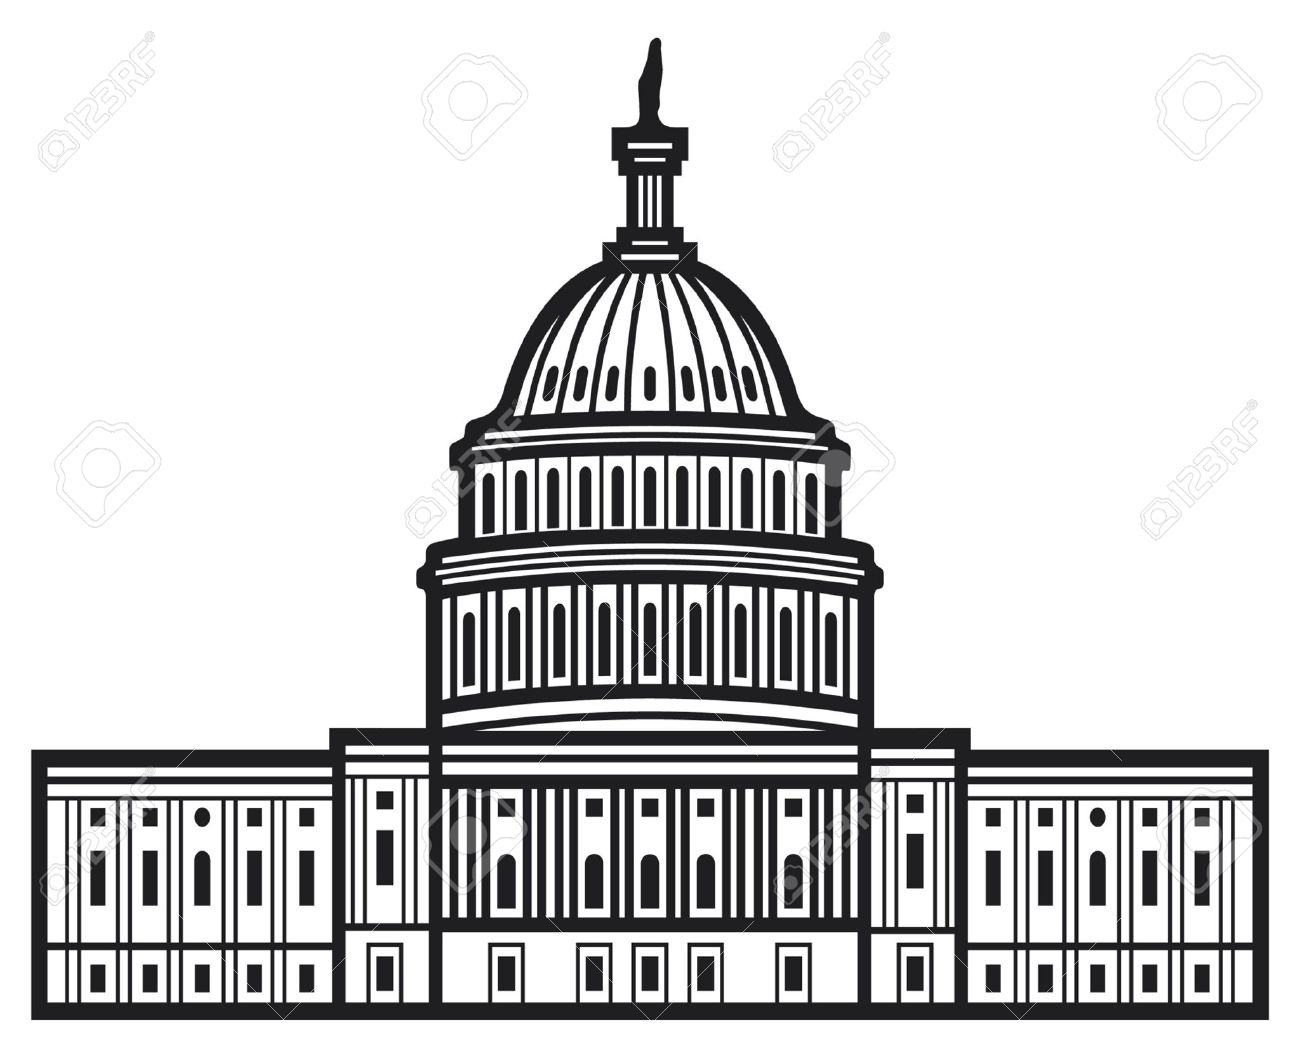 Congress building clipart.